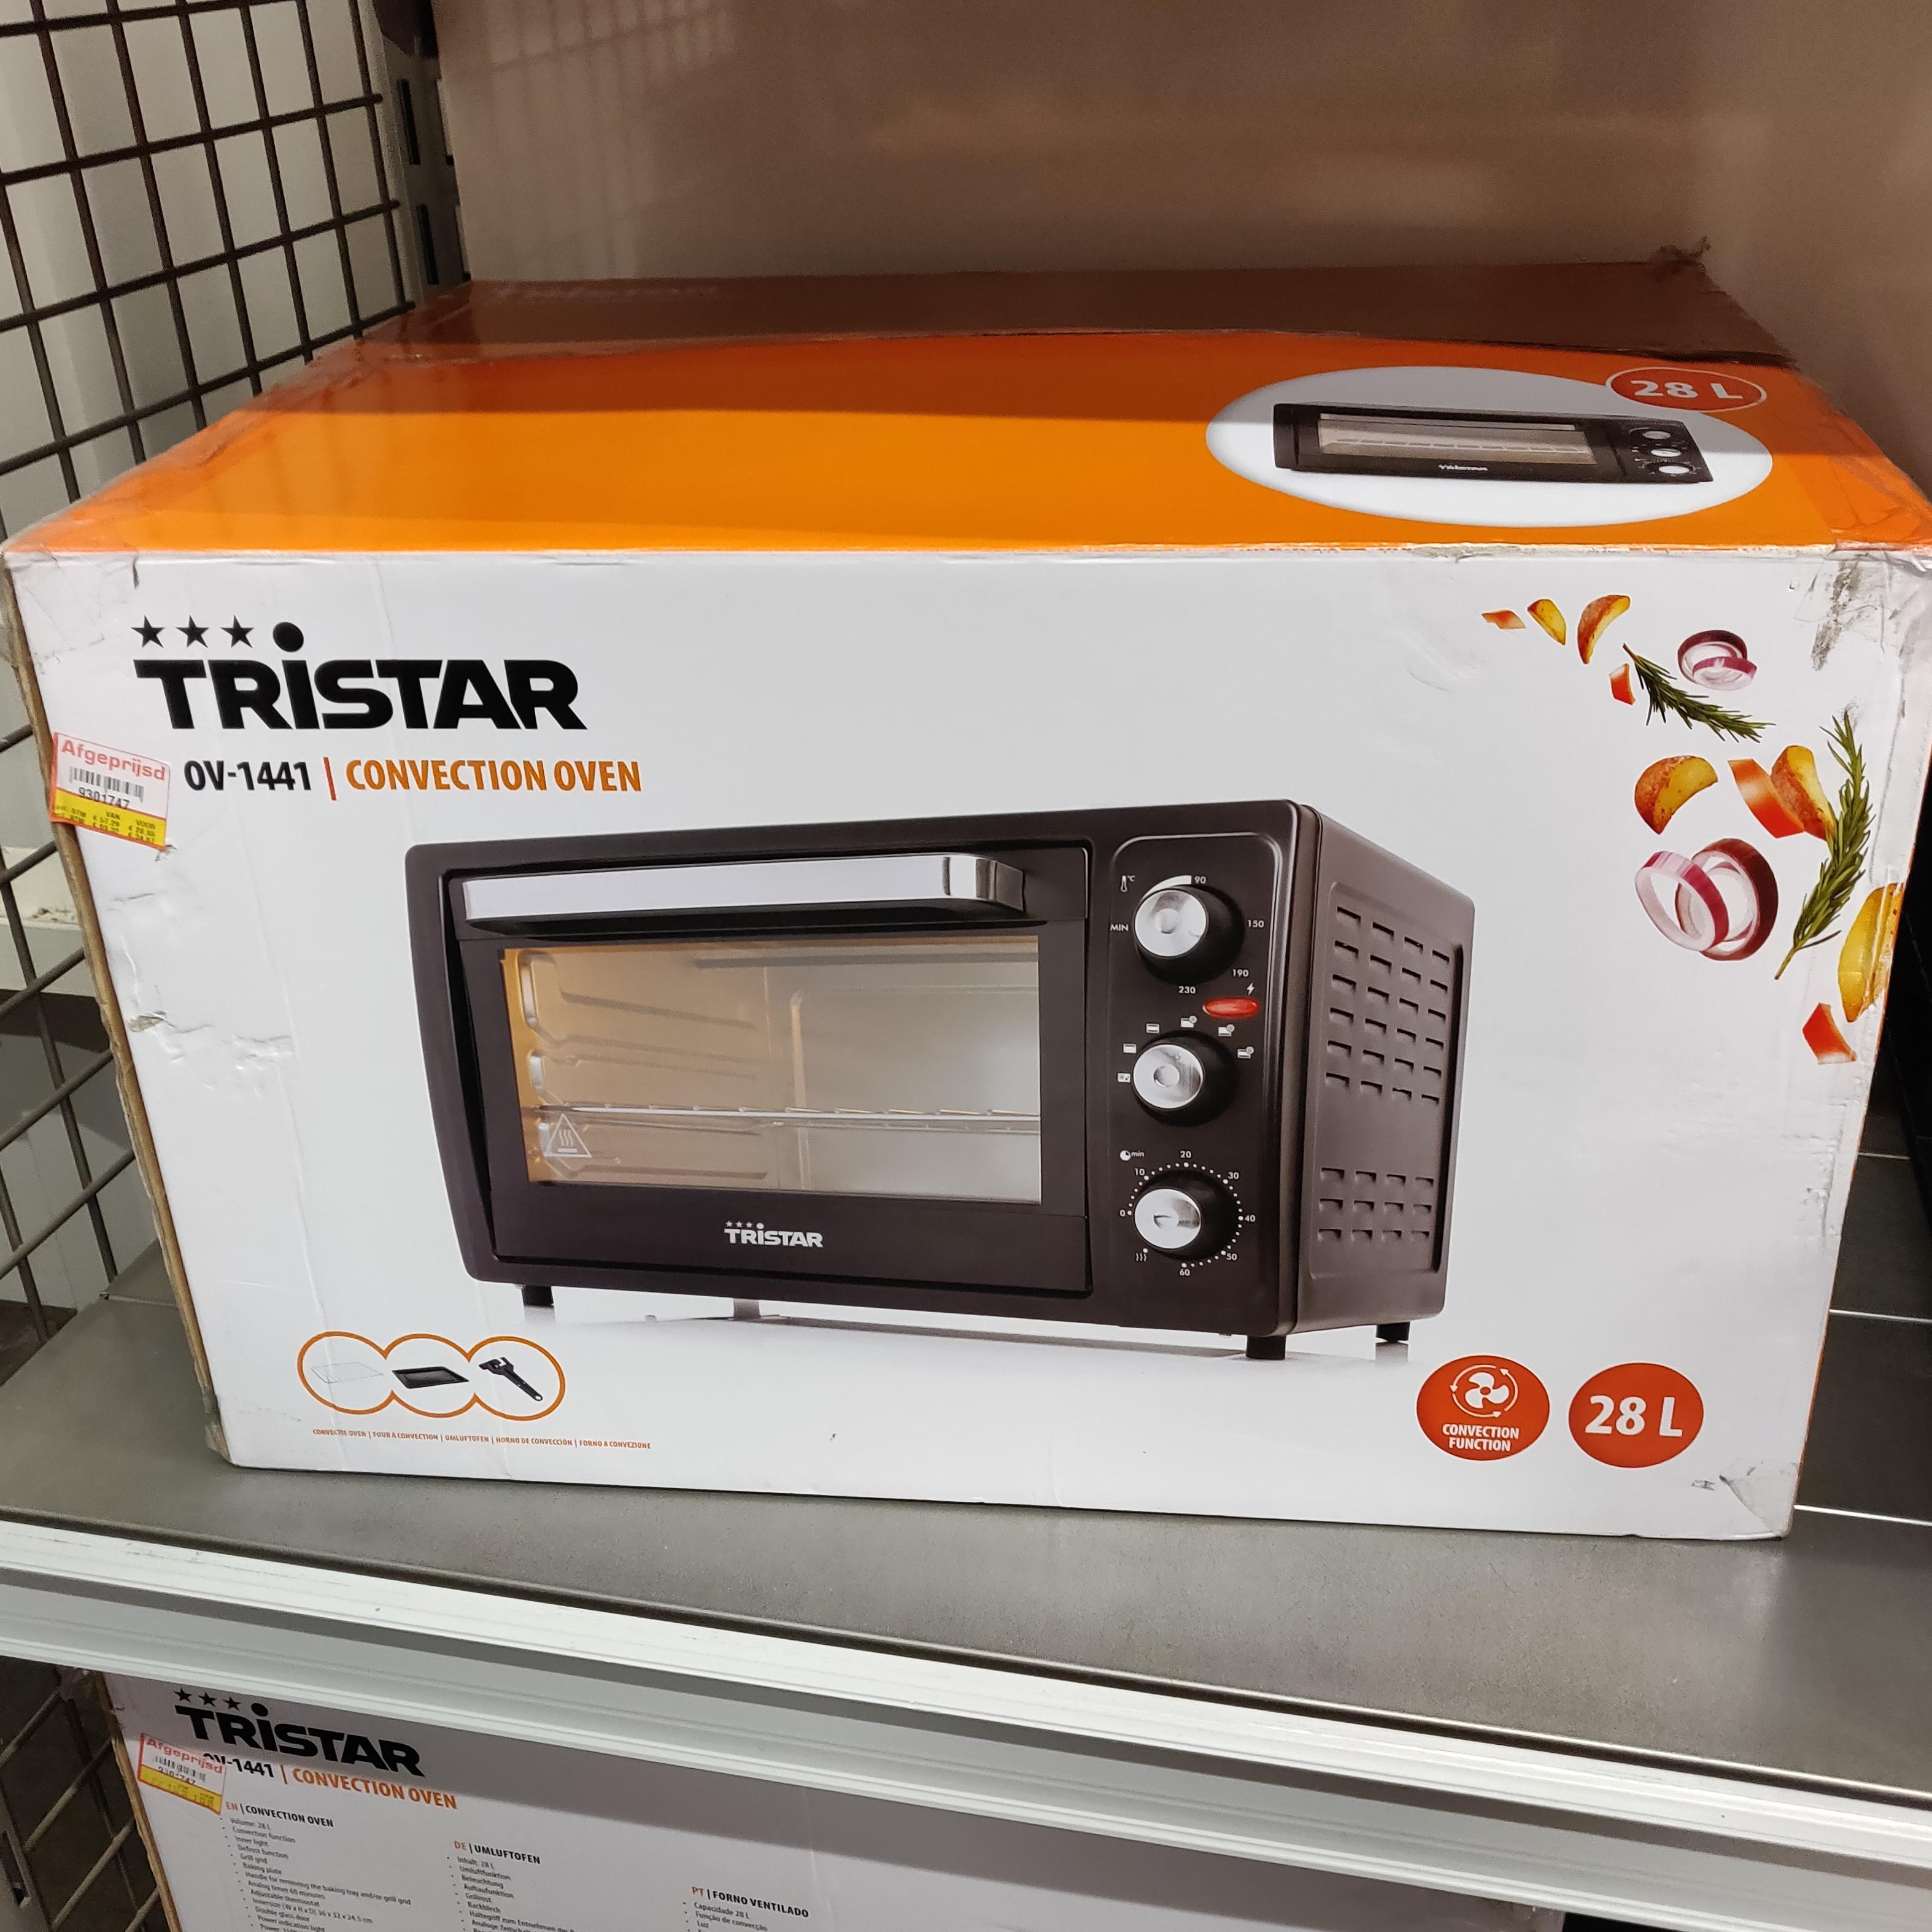 [Lokaal?] Tristar OV-1441 elektrische oven 28L @Makro Den Bosch